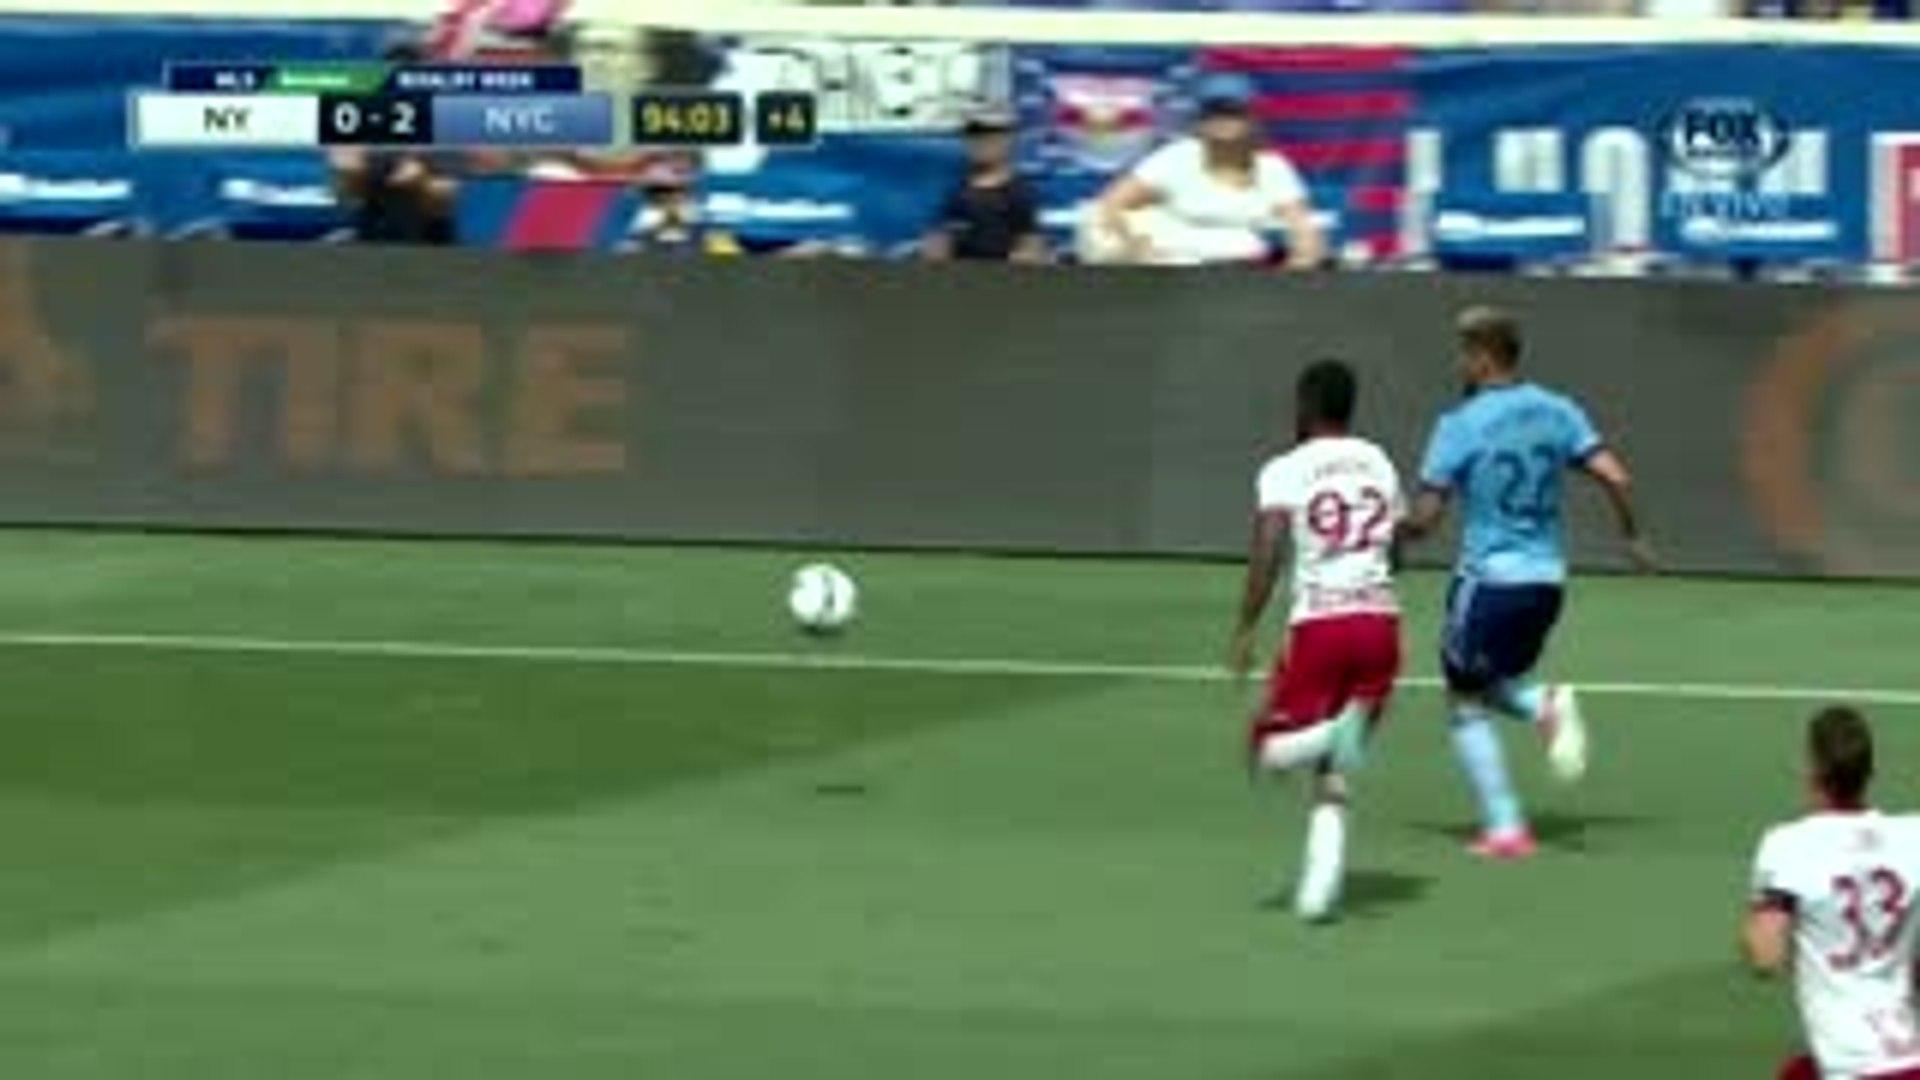 MLS Disciplinary Week 17: Kemar Lawrence challenge on Ronald Matarrita